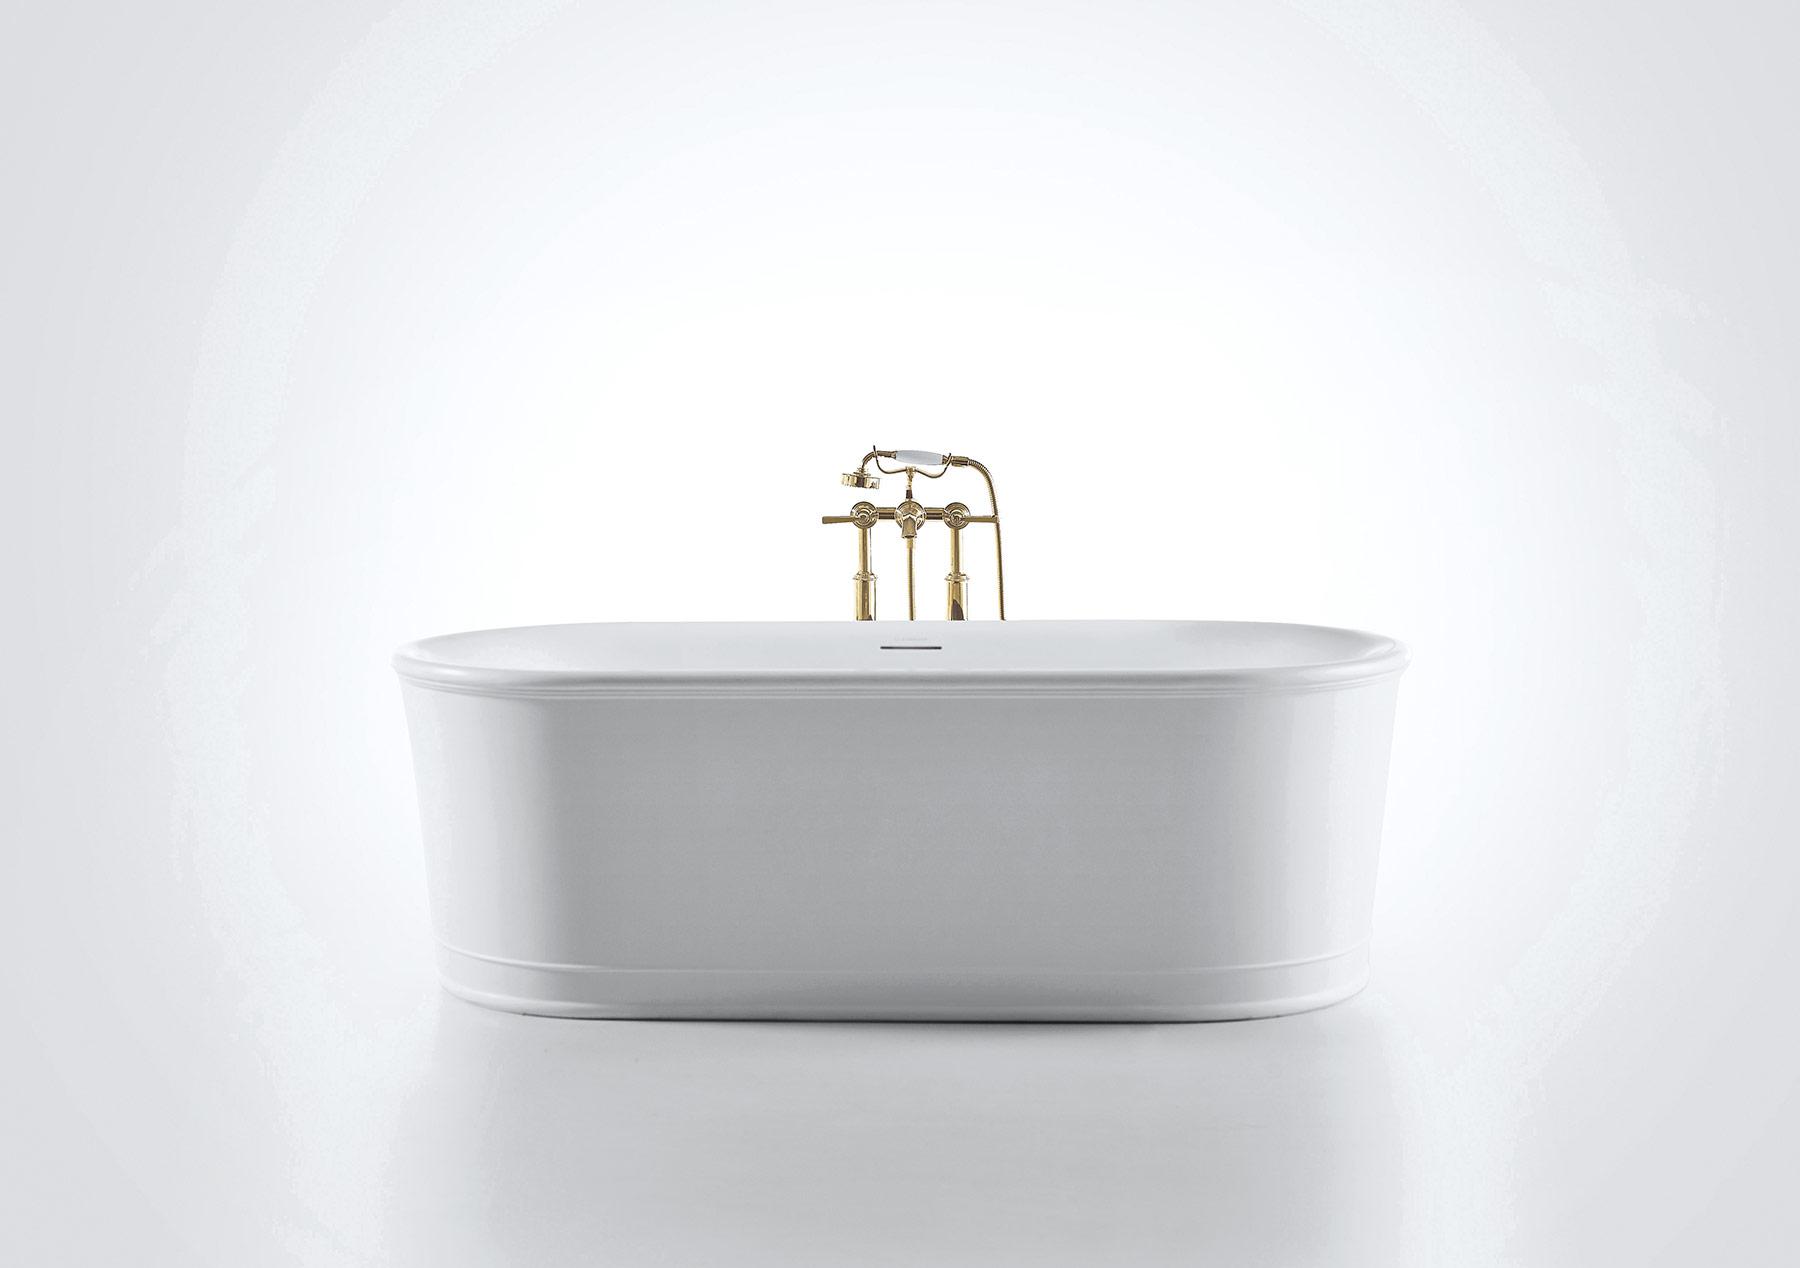 Traditional Chelsea Freestanding Bathtub